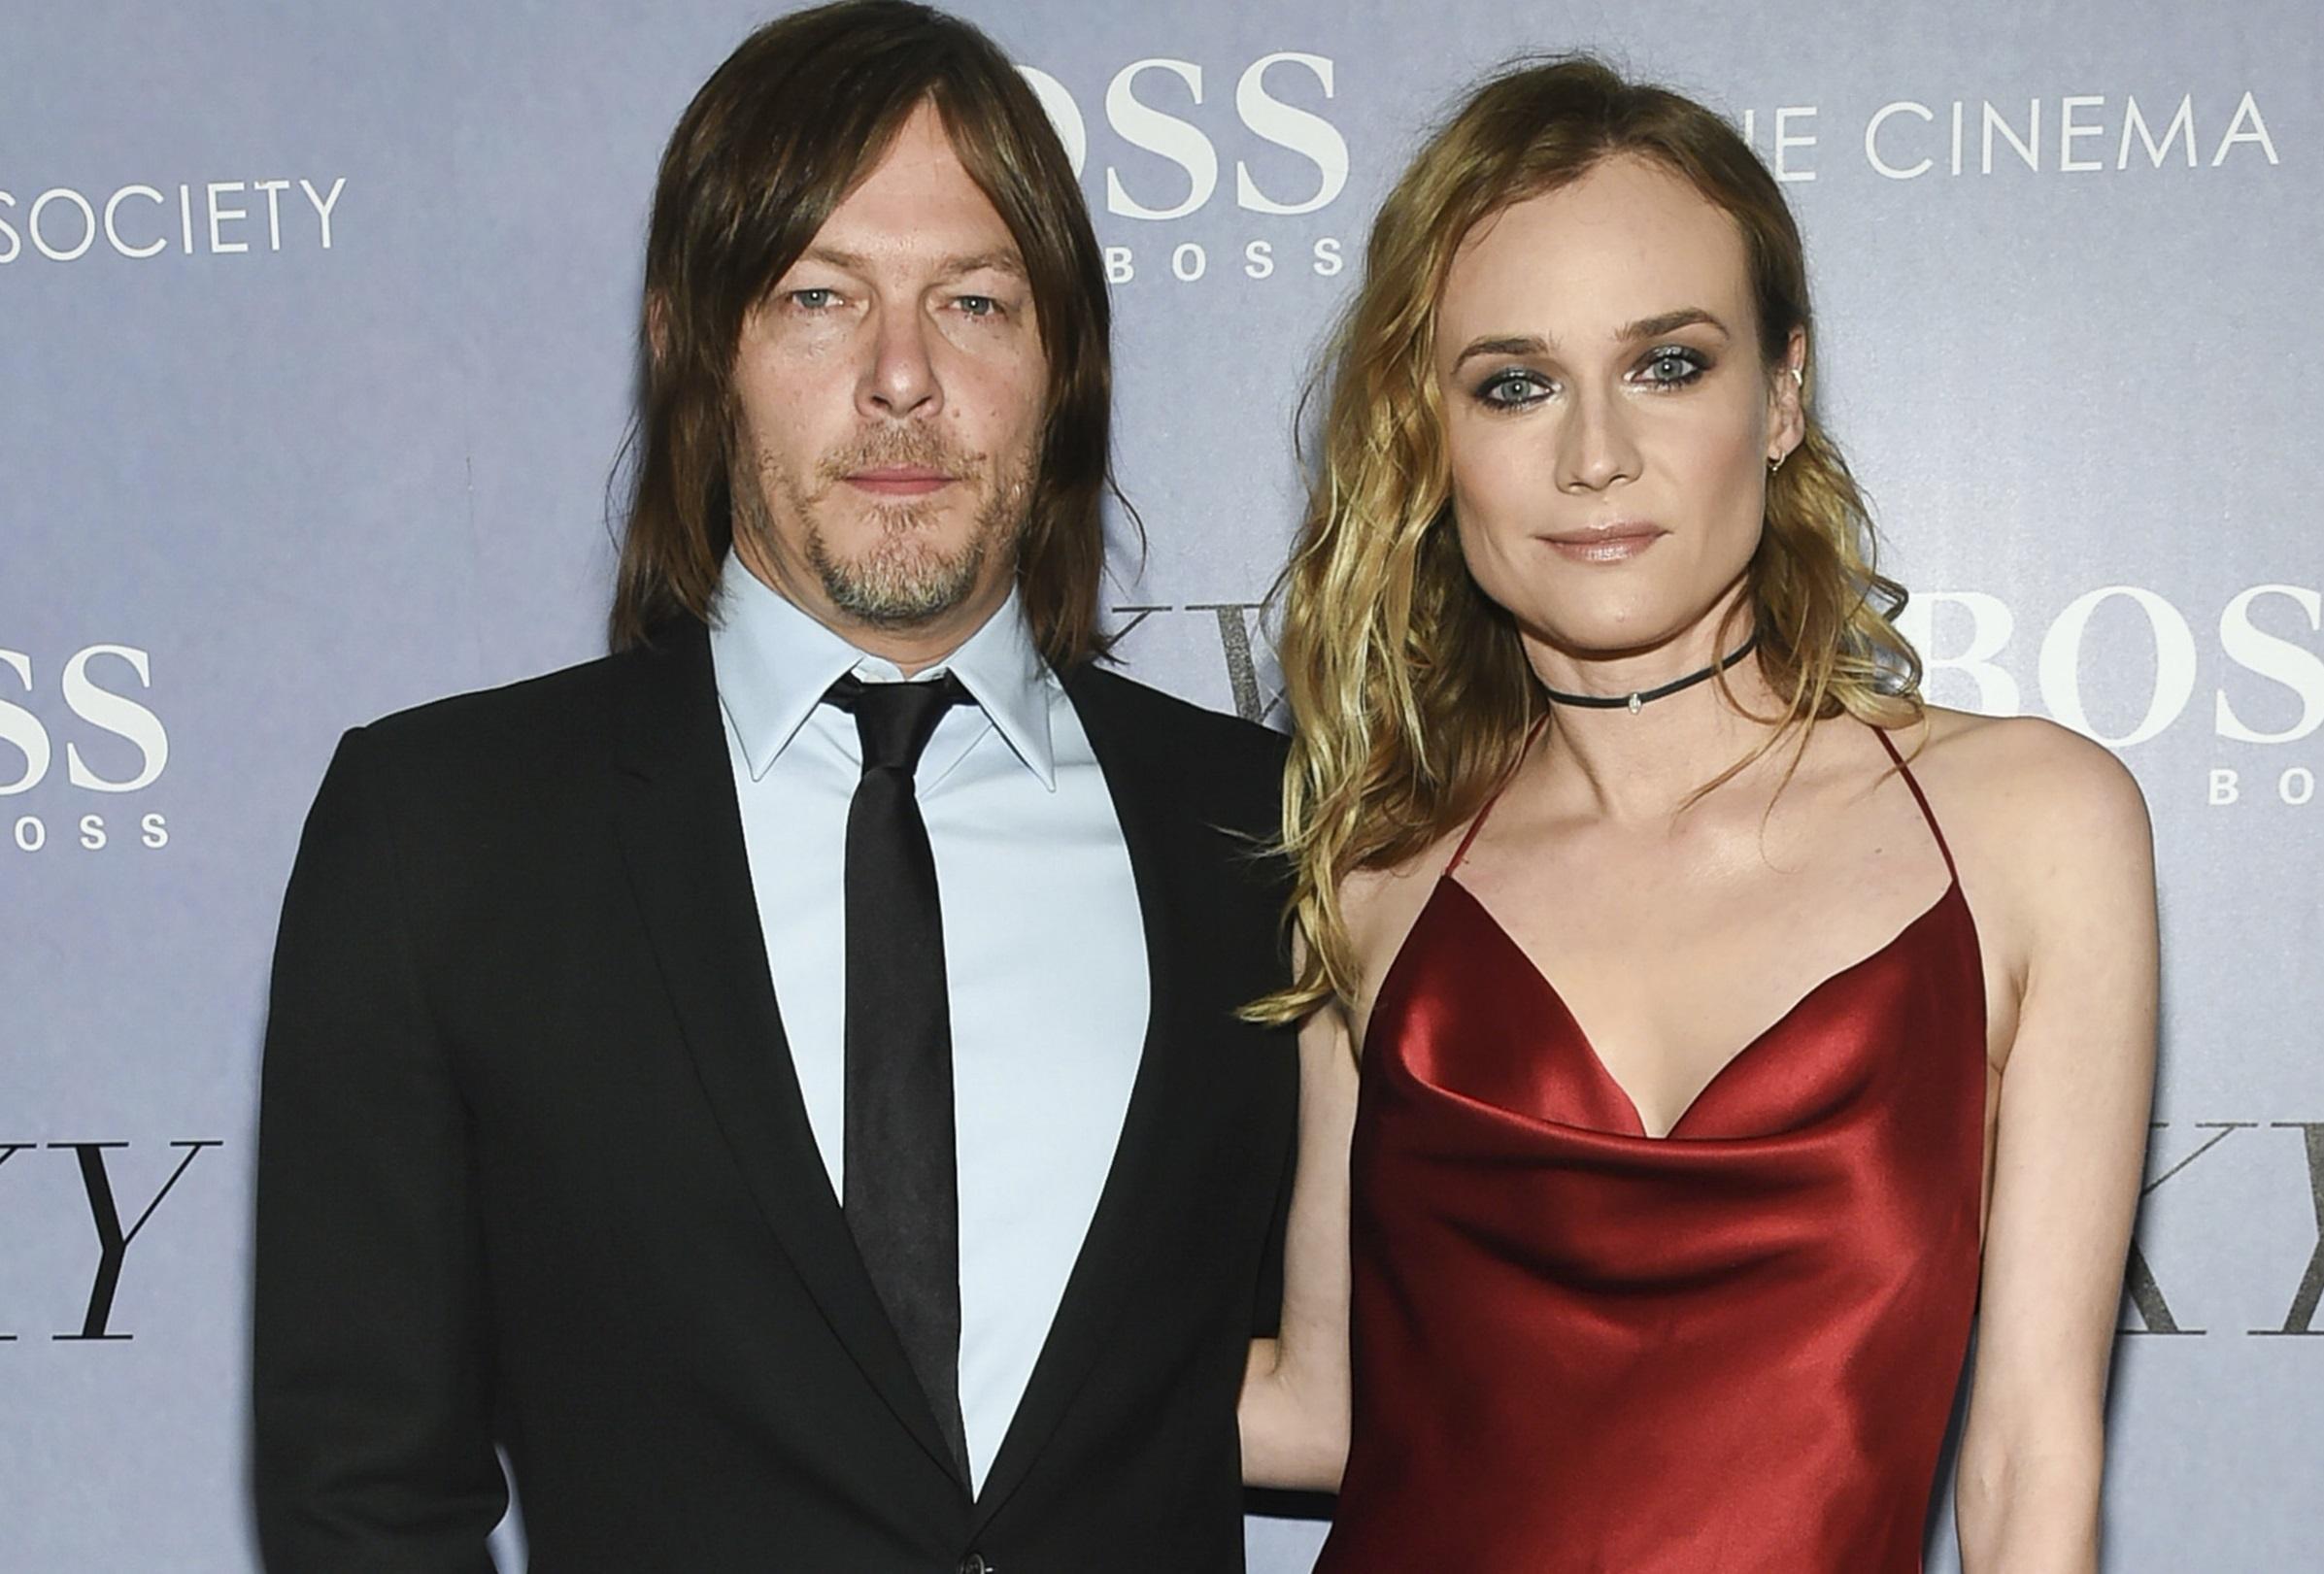 Norman reedus dating september 2019